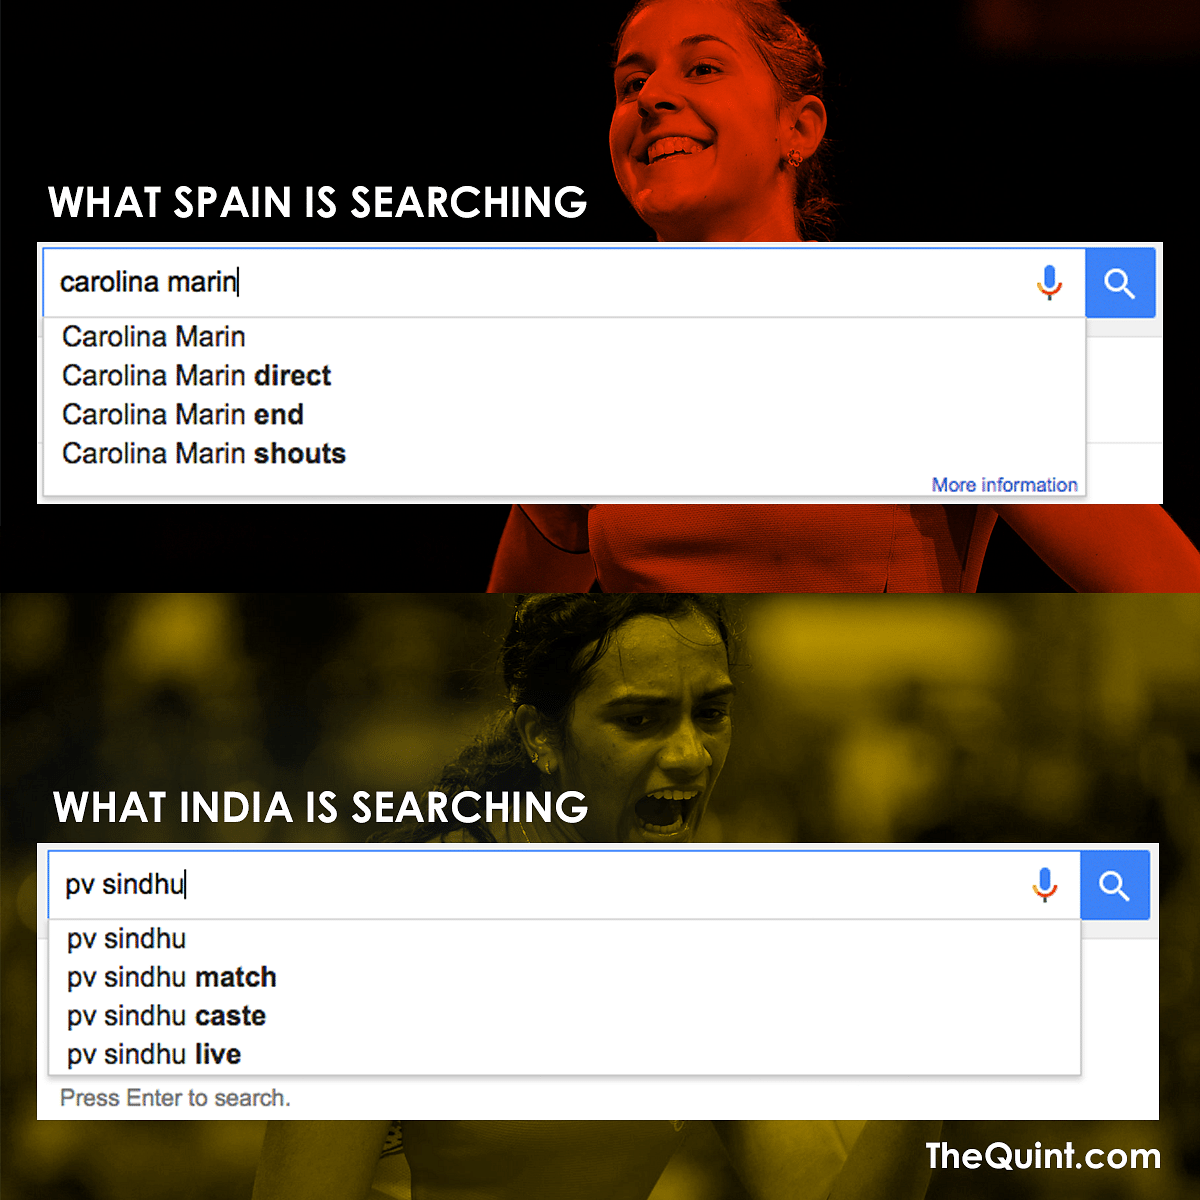 India v/s Spain (Design: Aaqib Raza Khan/<b>TheQuint</b>)